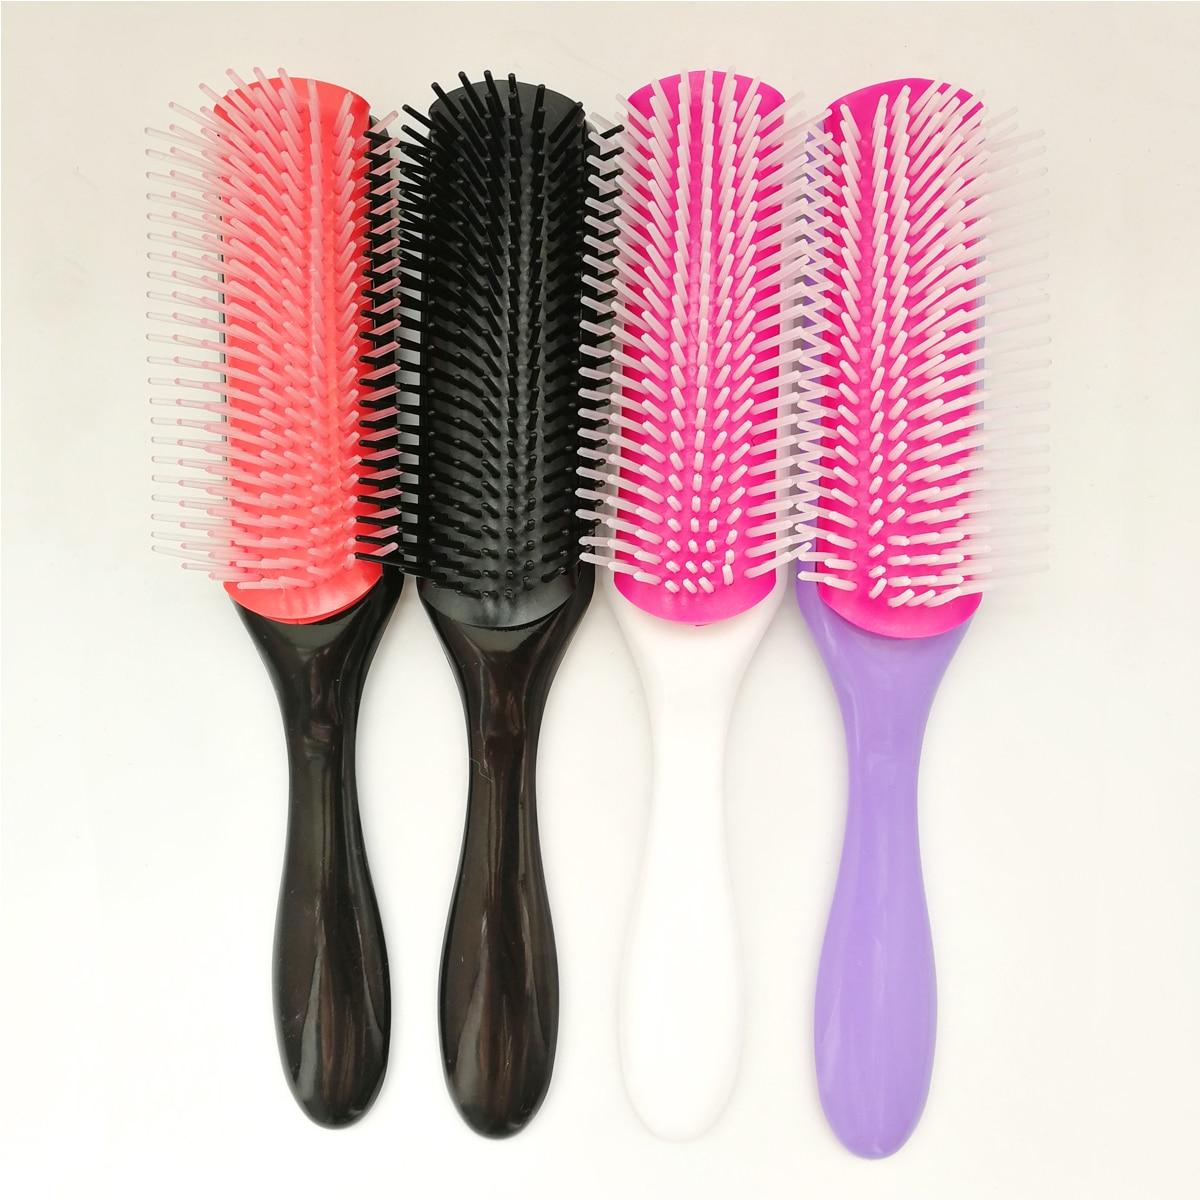 Handcraft 9 Rows Cushion Scalp Massage Brush Hair Styling Detangling Hairbrush Salon Hairdressing Women Straight Curly Hair Comb